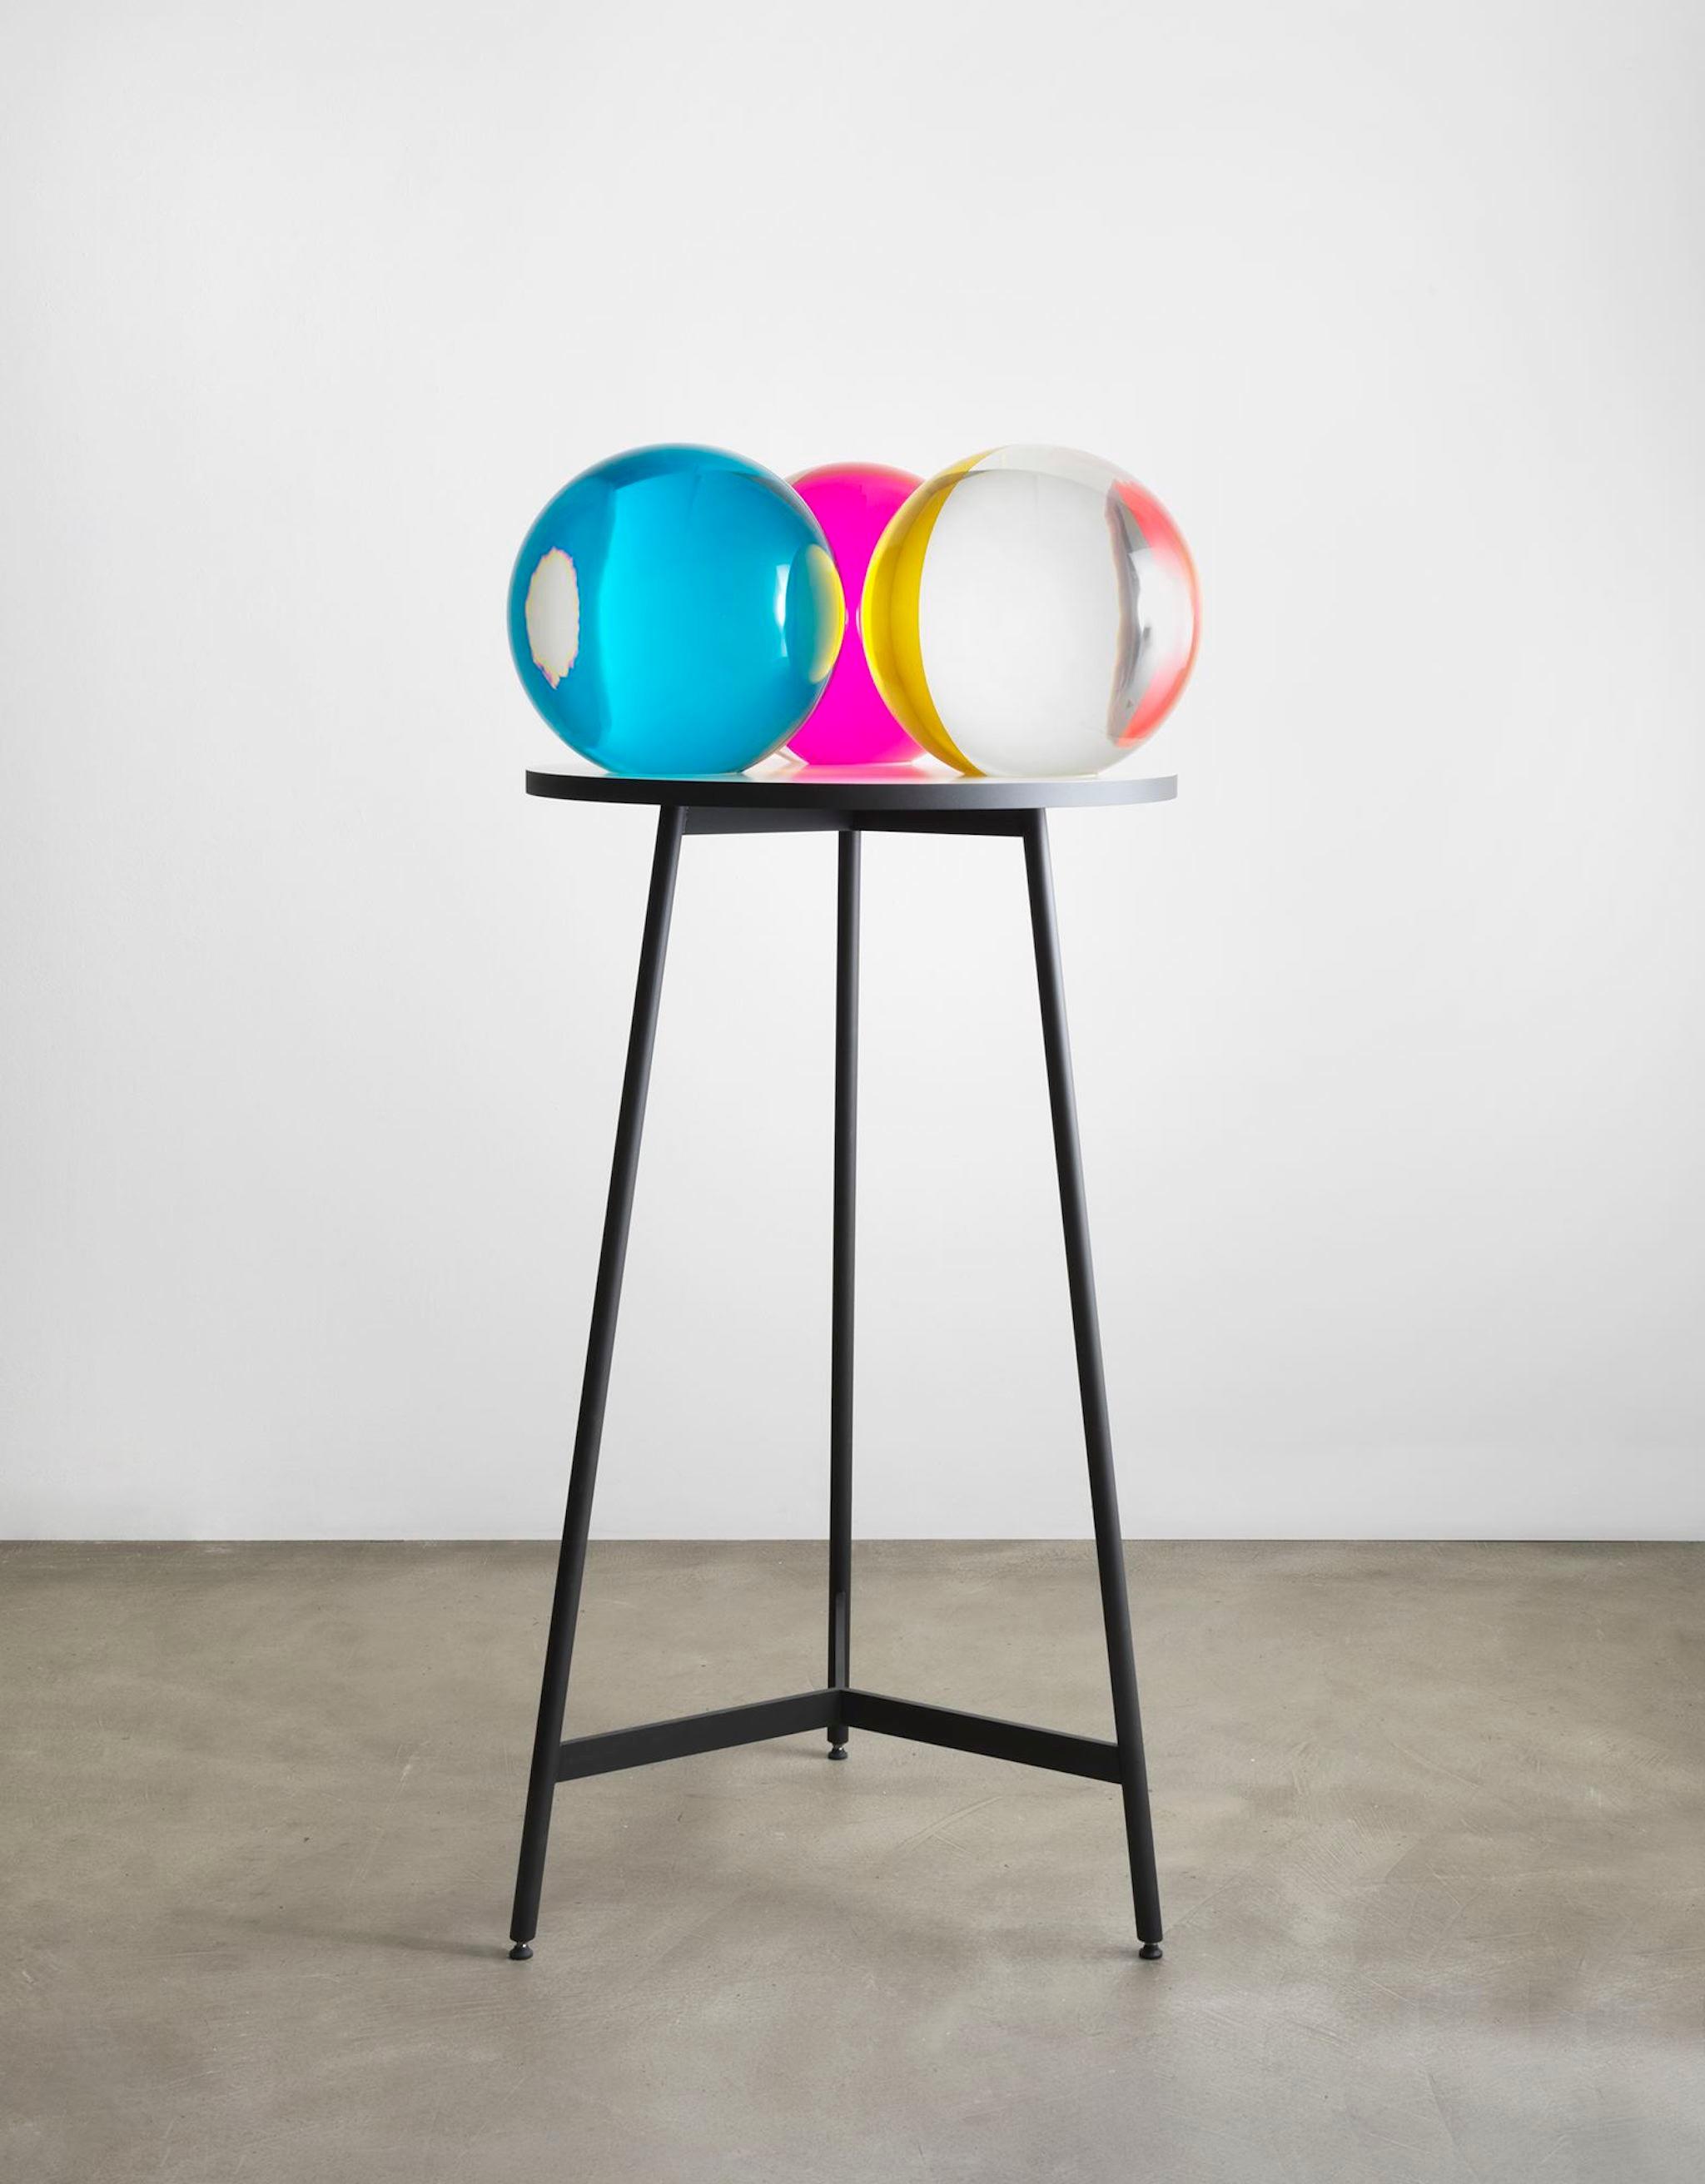 Best Galleries to Explore at Art Basel Miami 2018 - Olafur Eliasson tanya bonakdar Best Galleries to Explore at Art Basel Miami 2018: Tanya Bonakdar Best Galleries to Explore at Art Basel Miami 2018 Olafur Eliasson